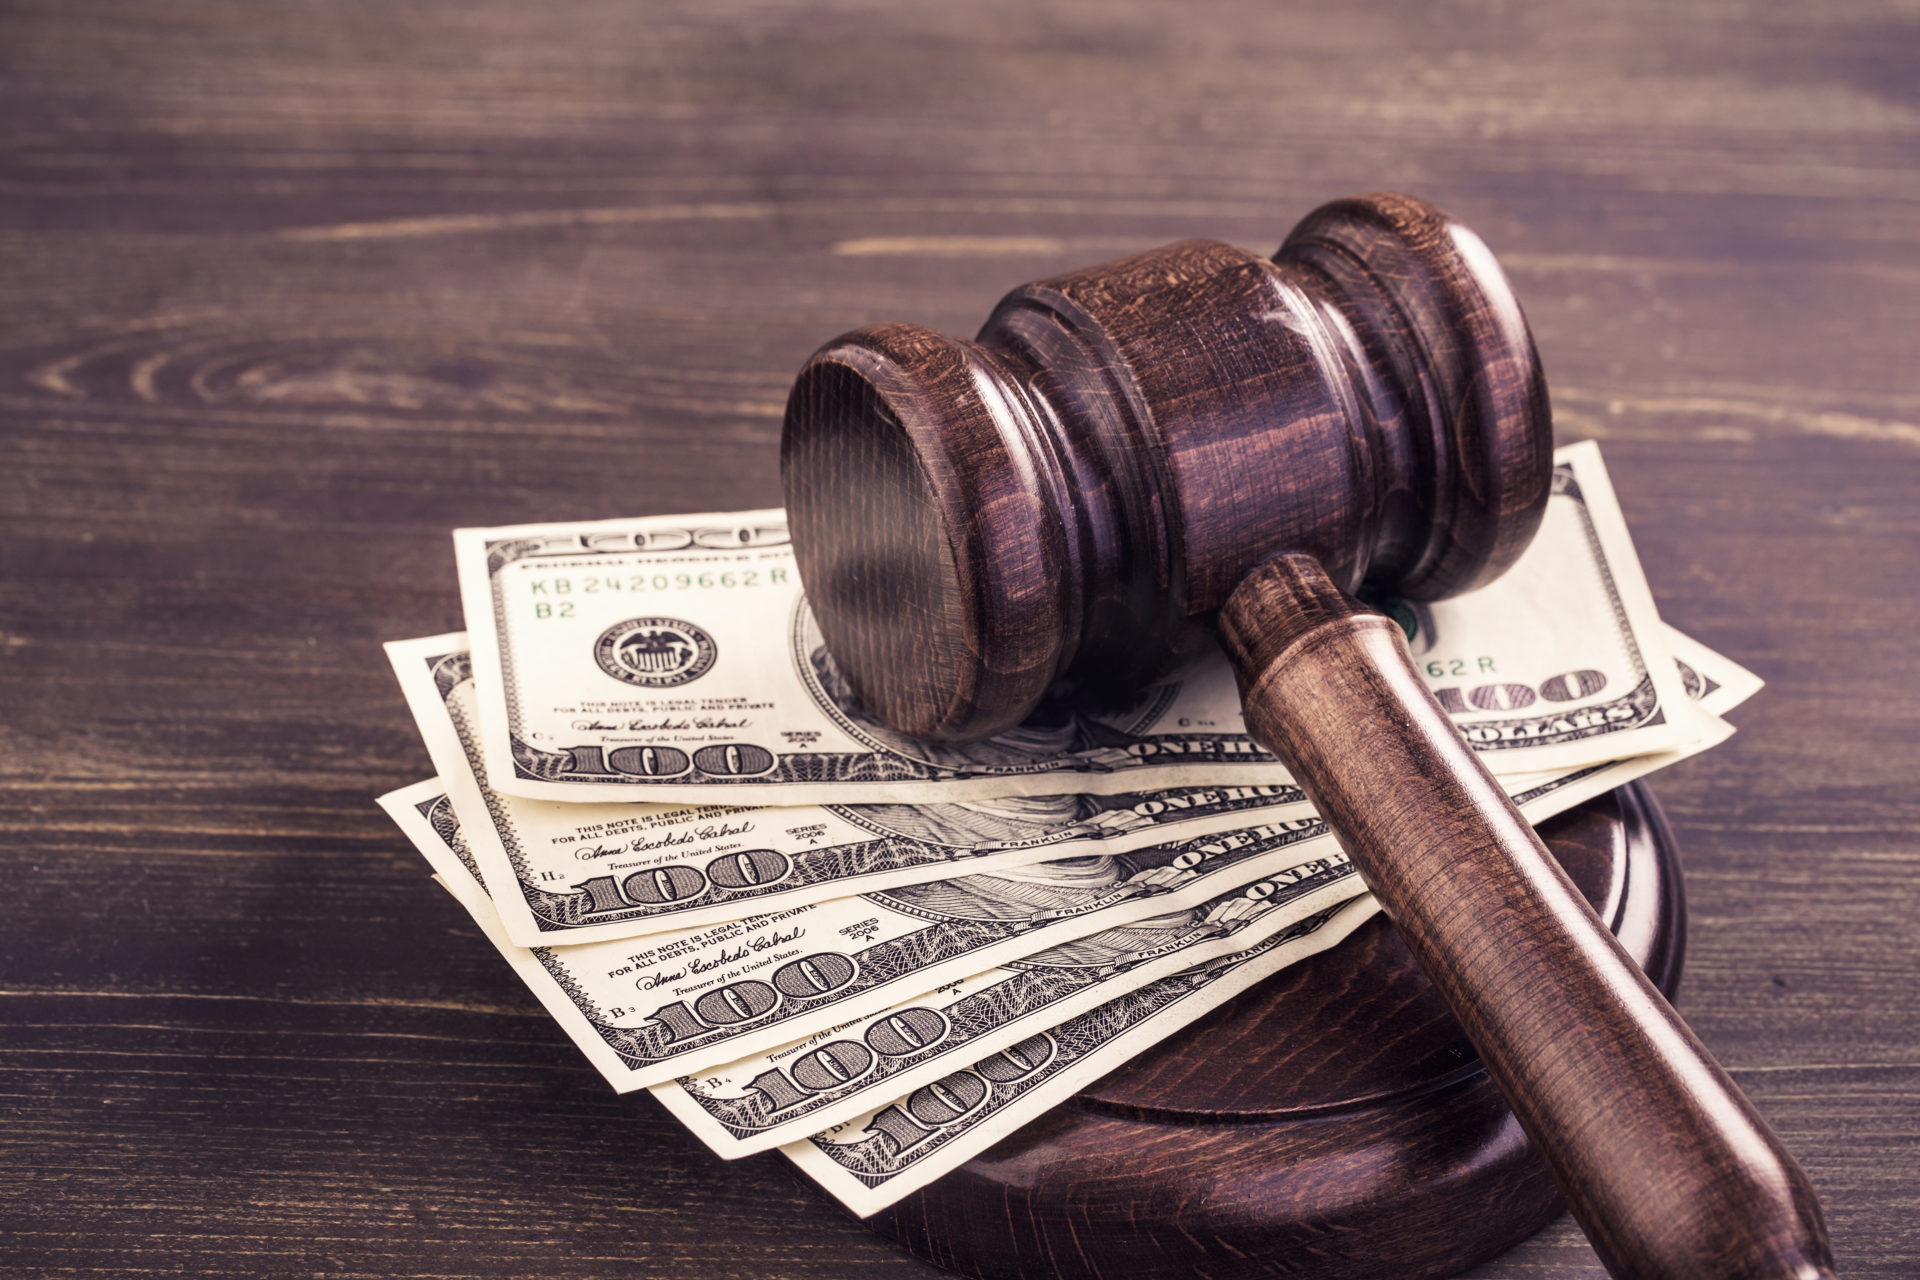 gavel and cash representing criminal fees.